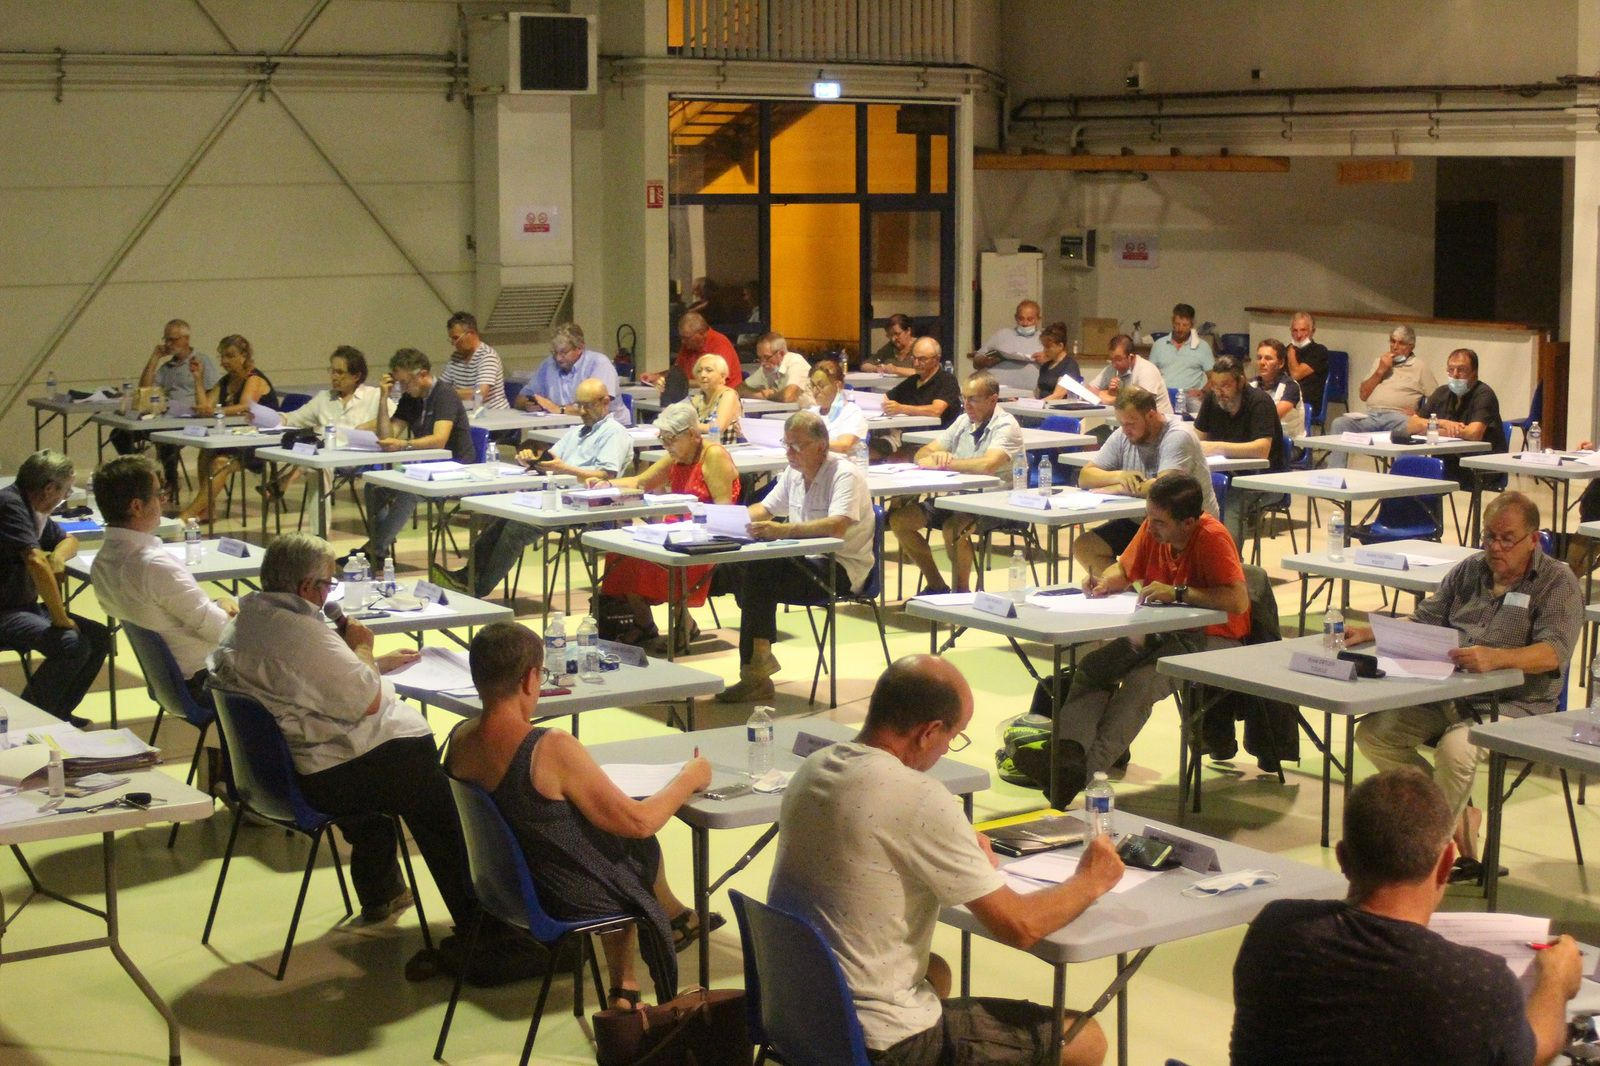 Cagire - Garonne - Salat - Conseil communautaire du JEUDI 22 OCTOBRE 2020